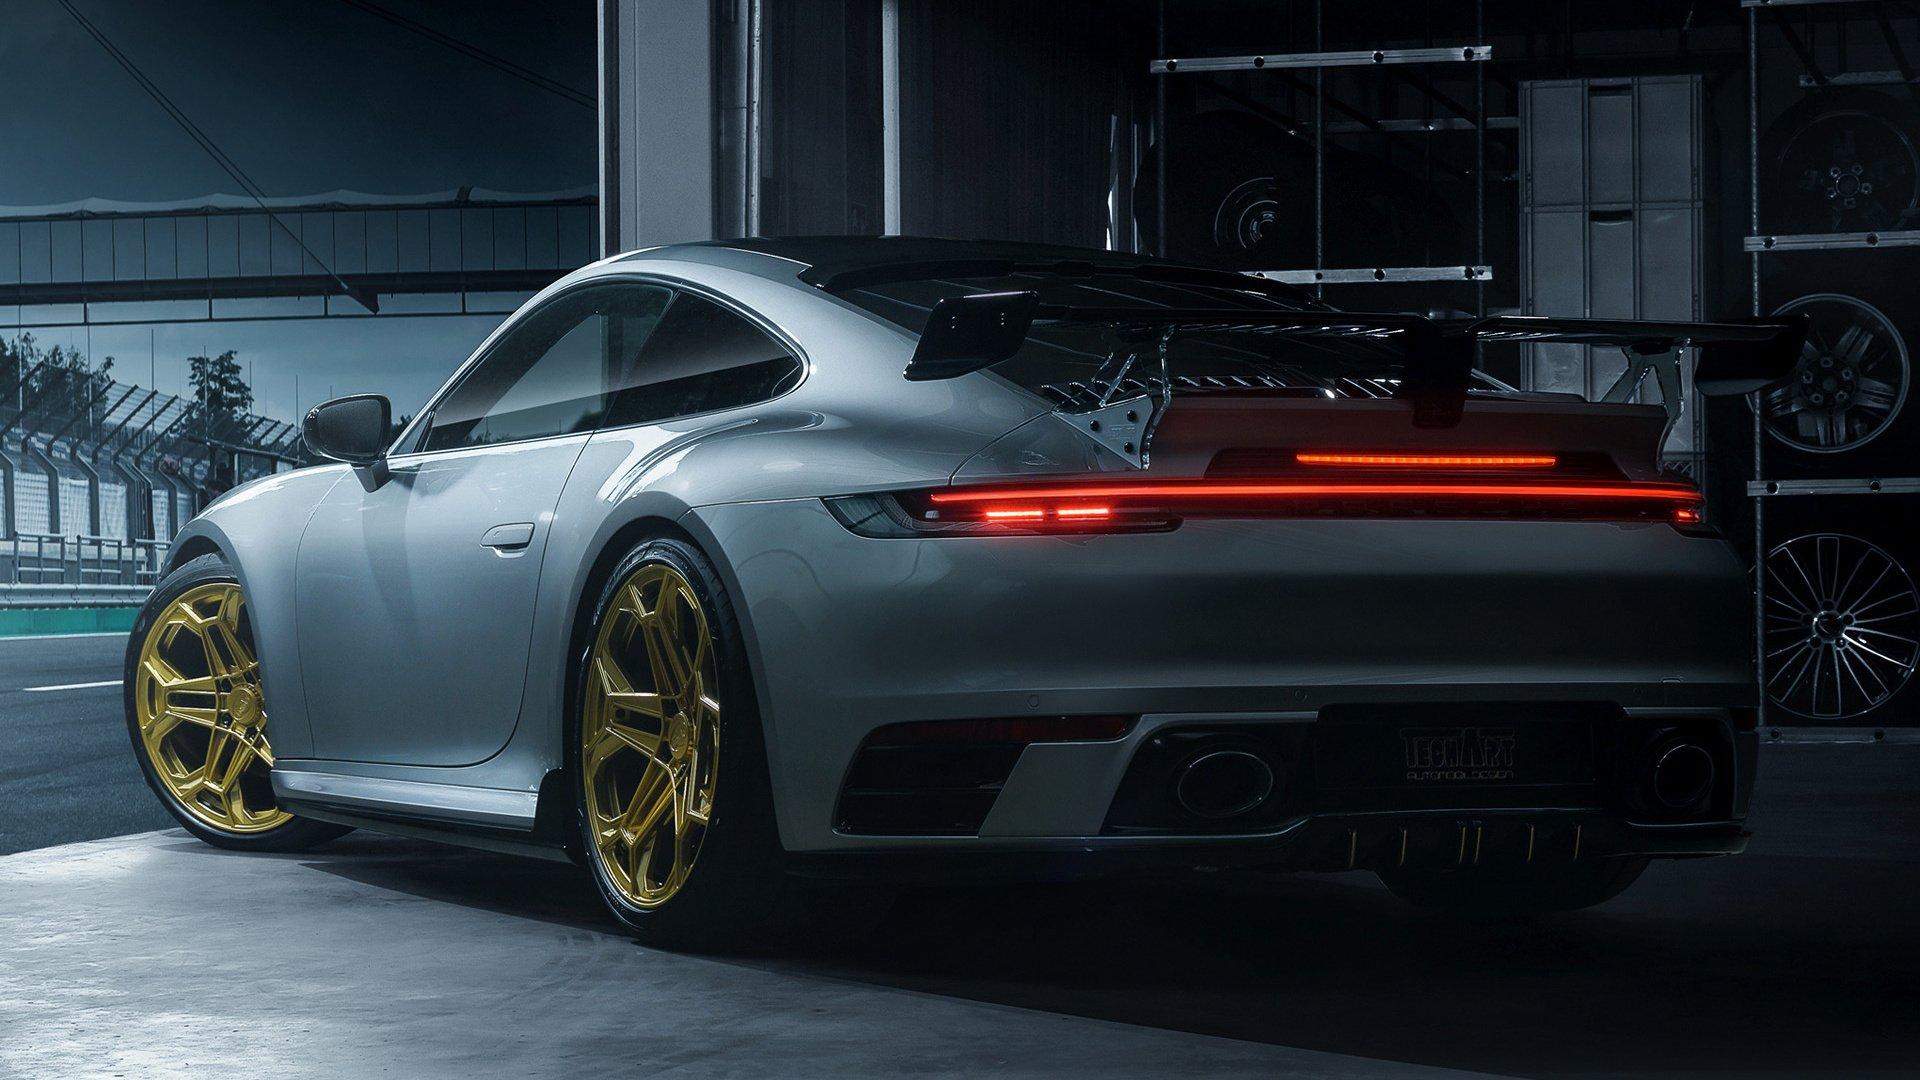 2019 Porsche 911 992 Carrera S By Techart Fondo De